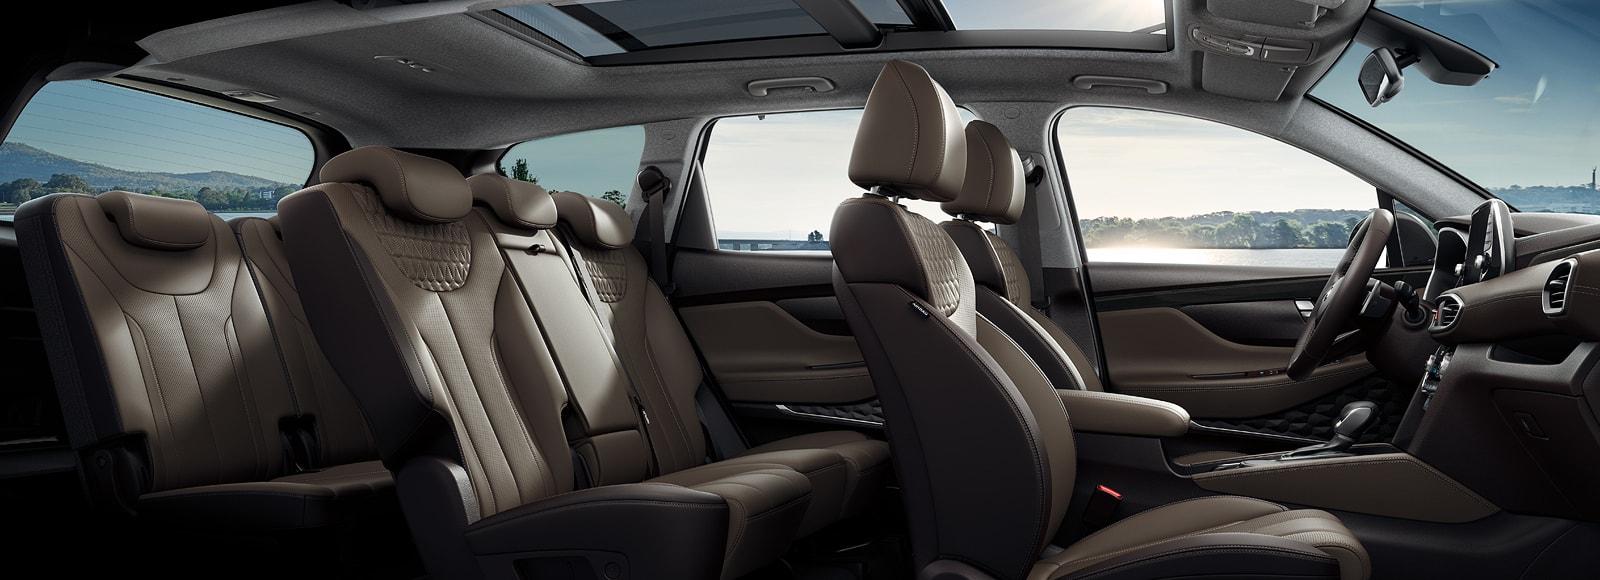 Hyundai Santa Fe Interior Honduras detalle